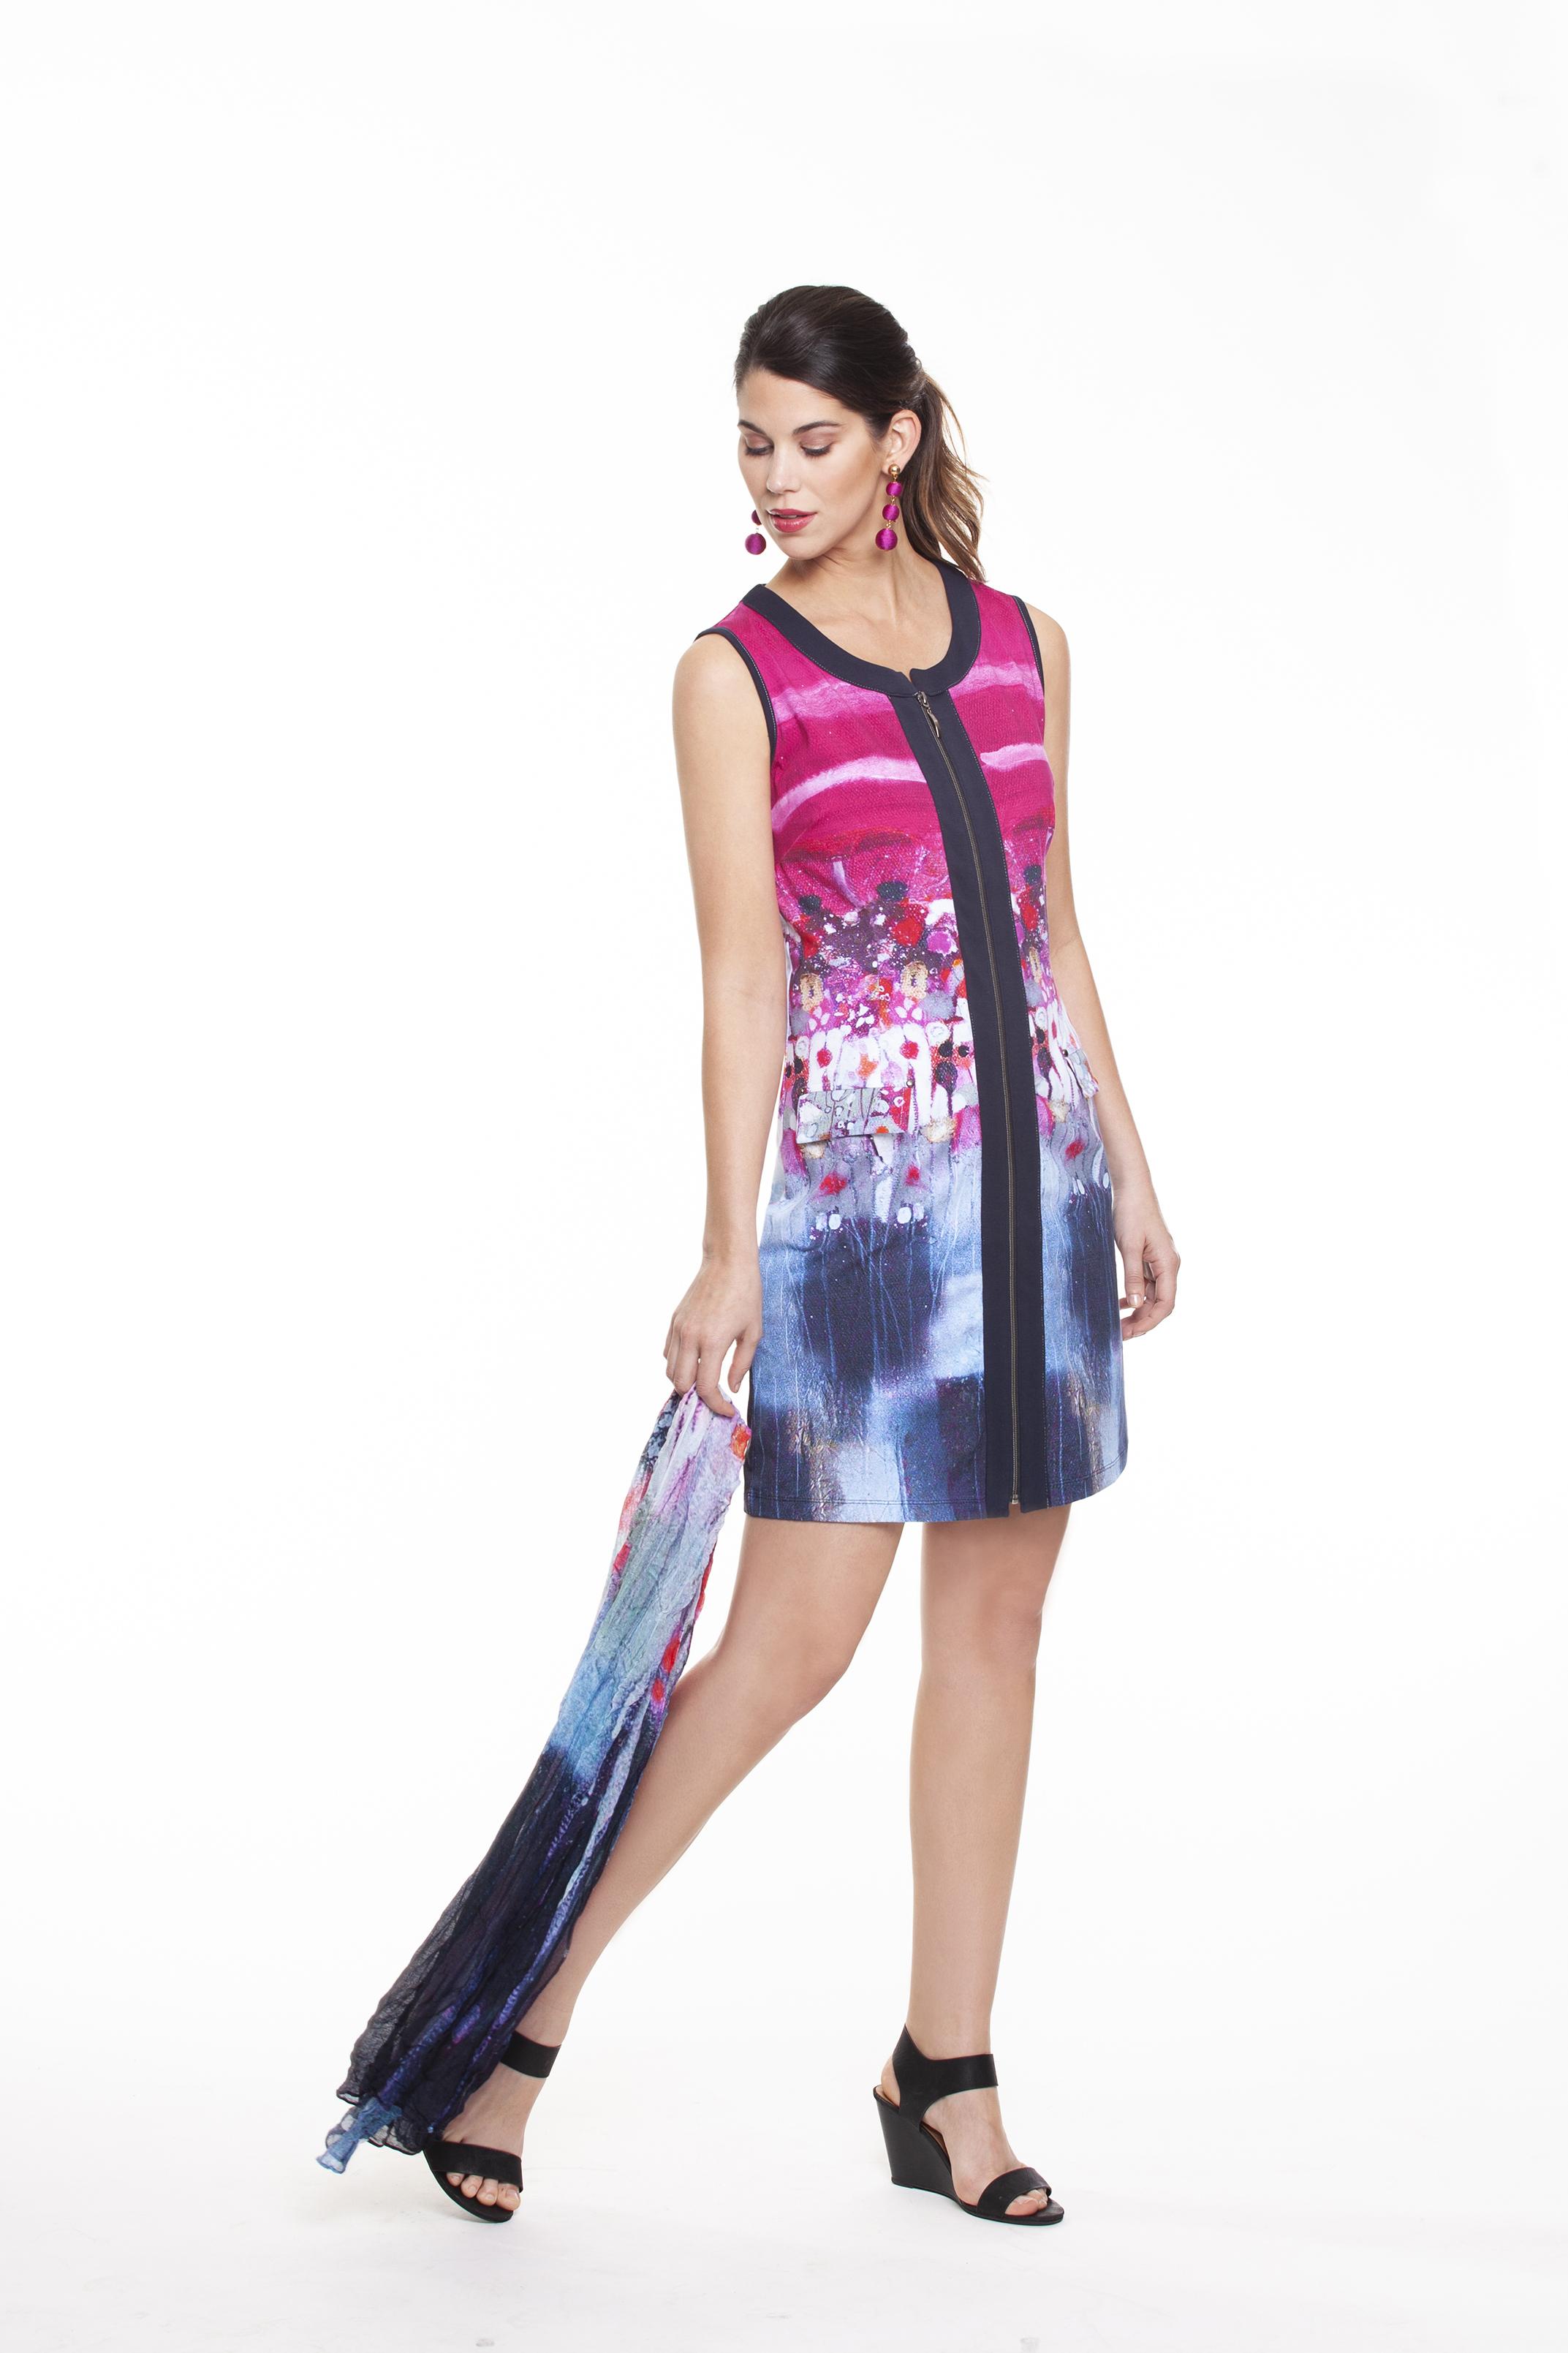 Simply Art Dolcezza: Fuschia Candy Storm Abstract Art Zip Dress